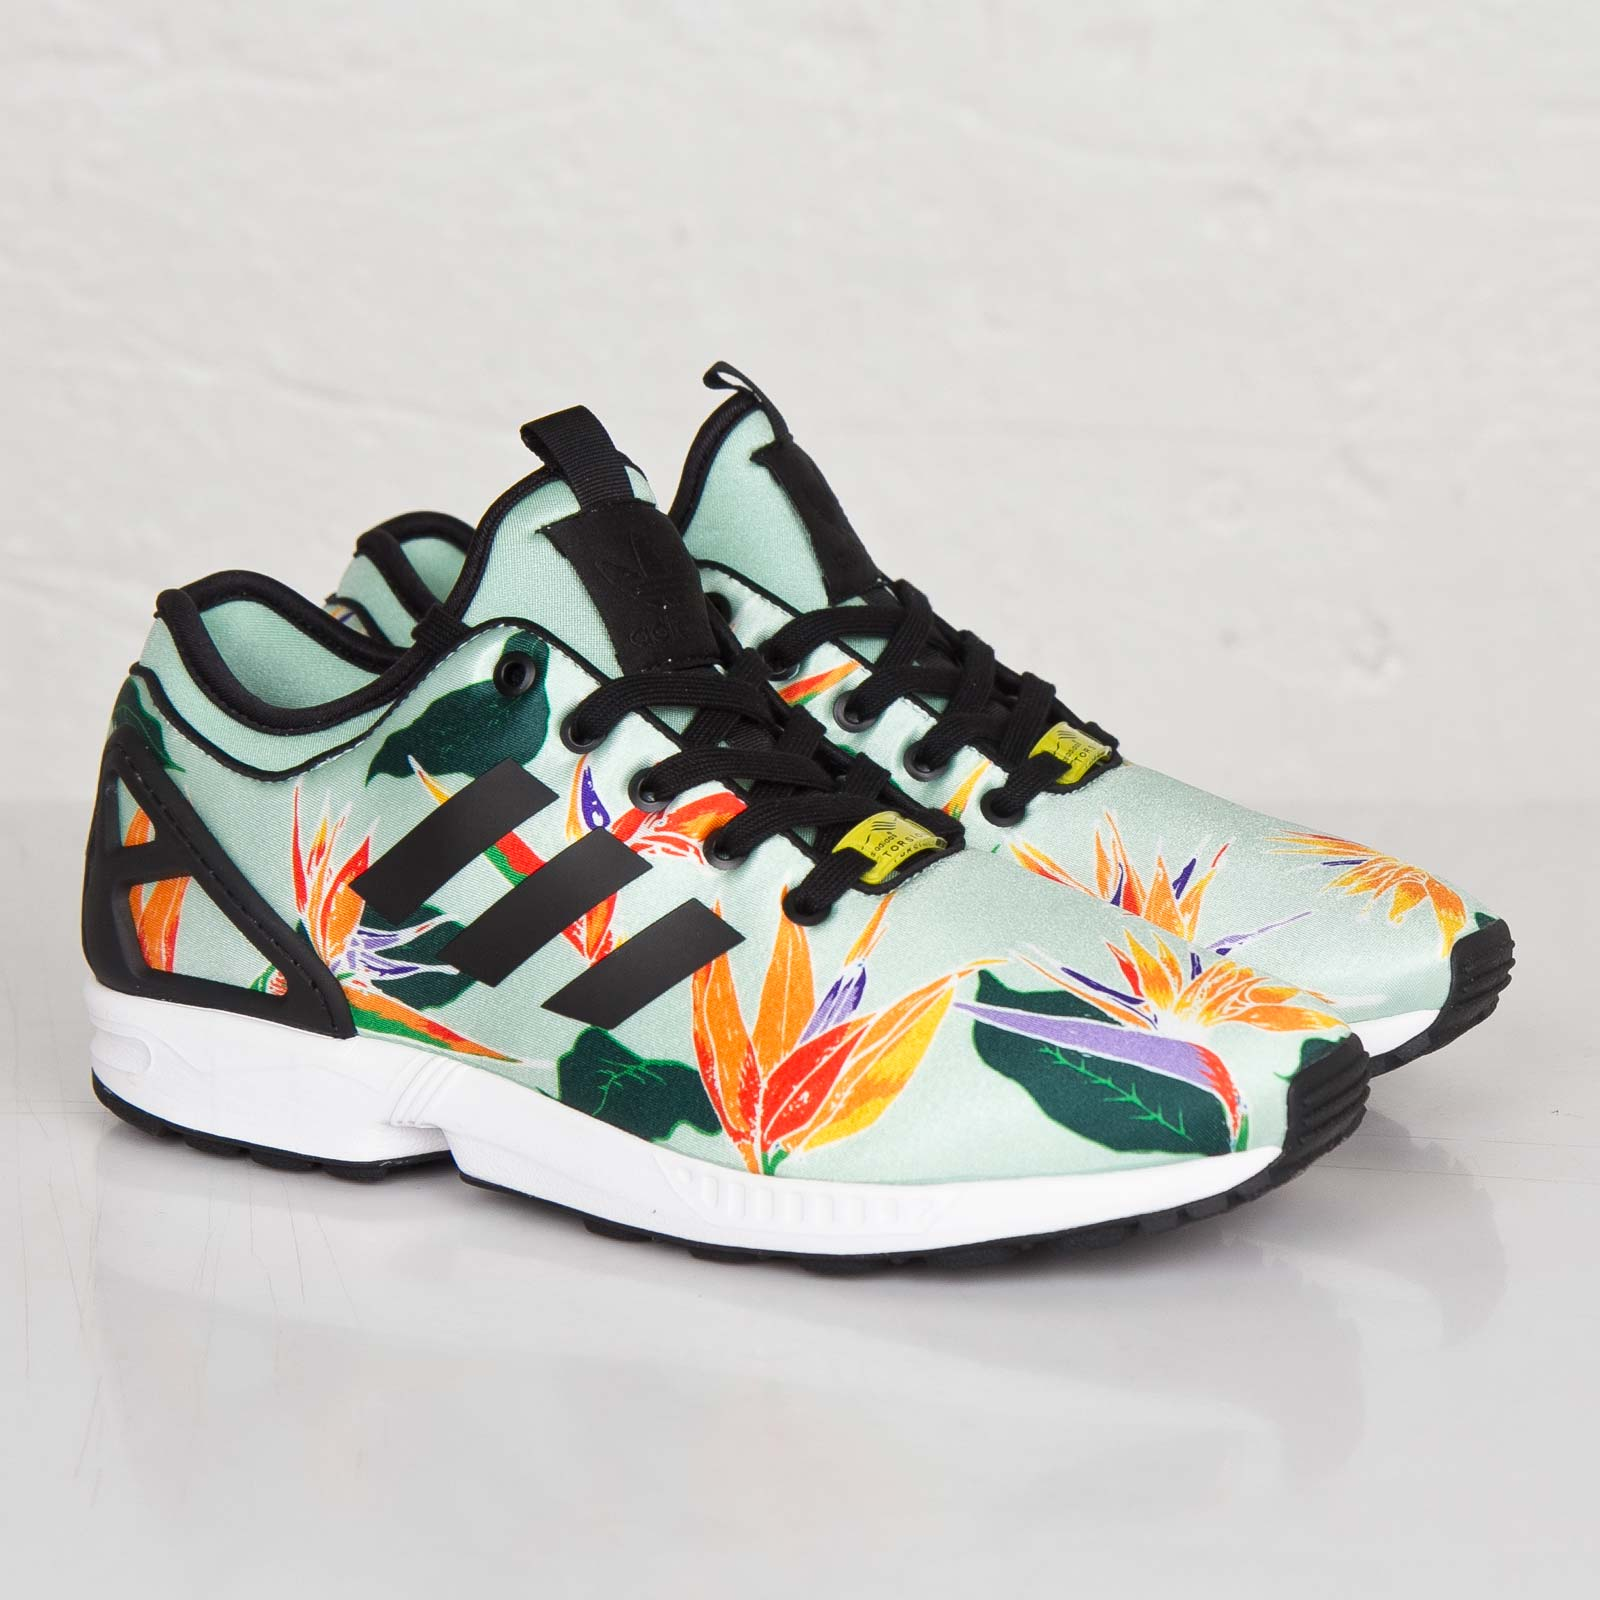 the best attitude 225a9 d4eac adidas ZX Flux NPS - B34468 - Sneakersnstuff   sneakers ...